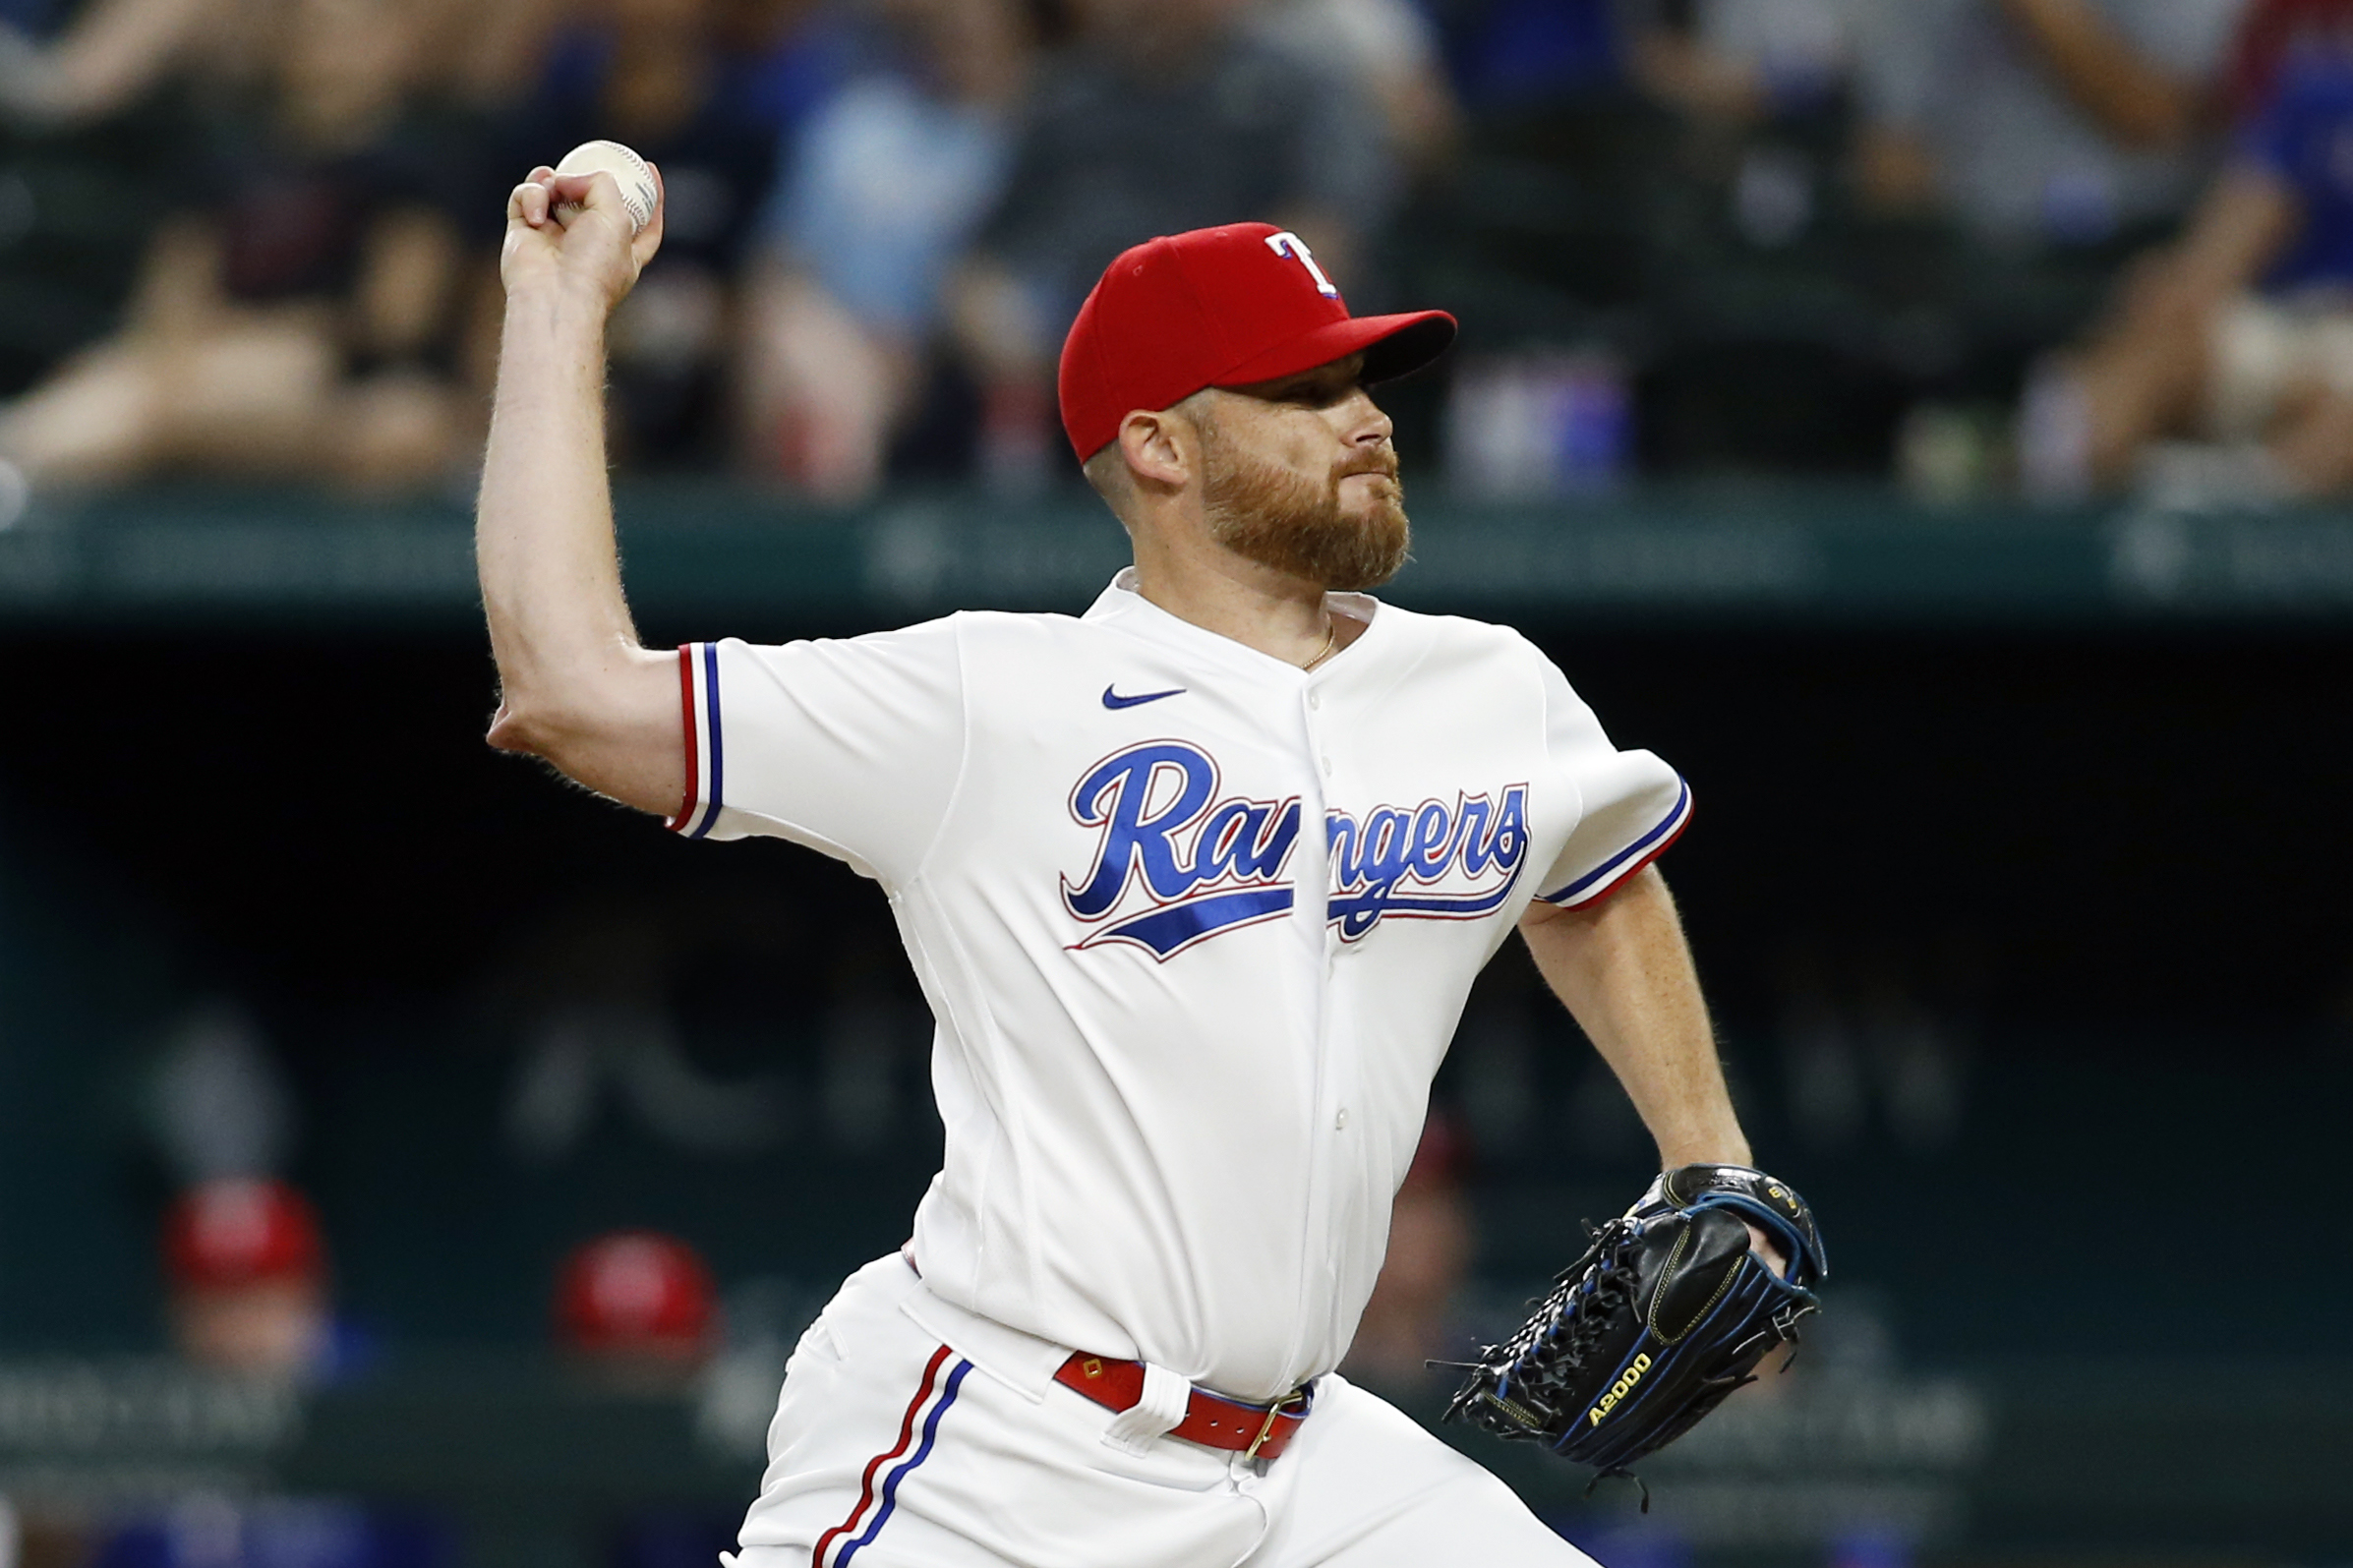 MLB: Arizona Diamondbacks at Texas Rangers